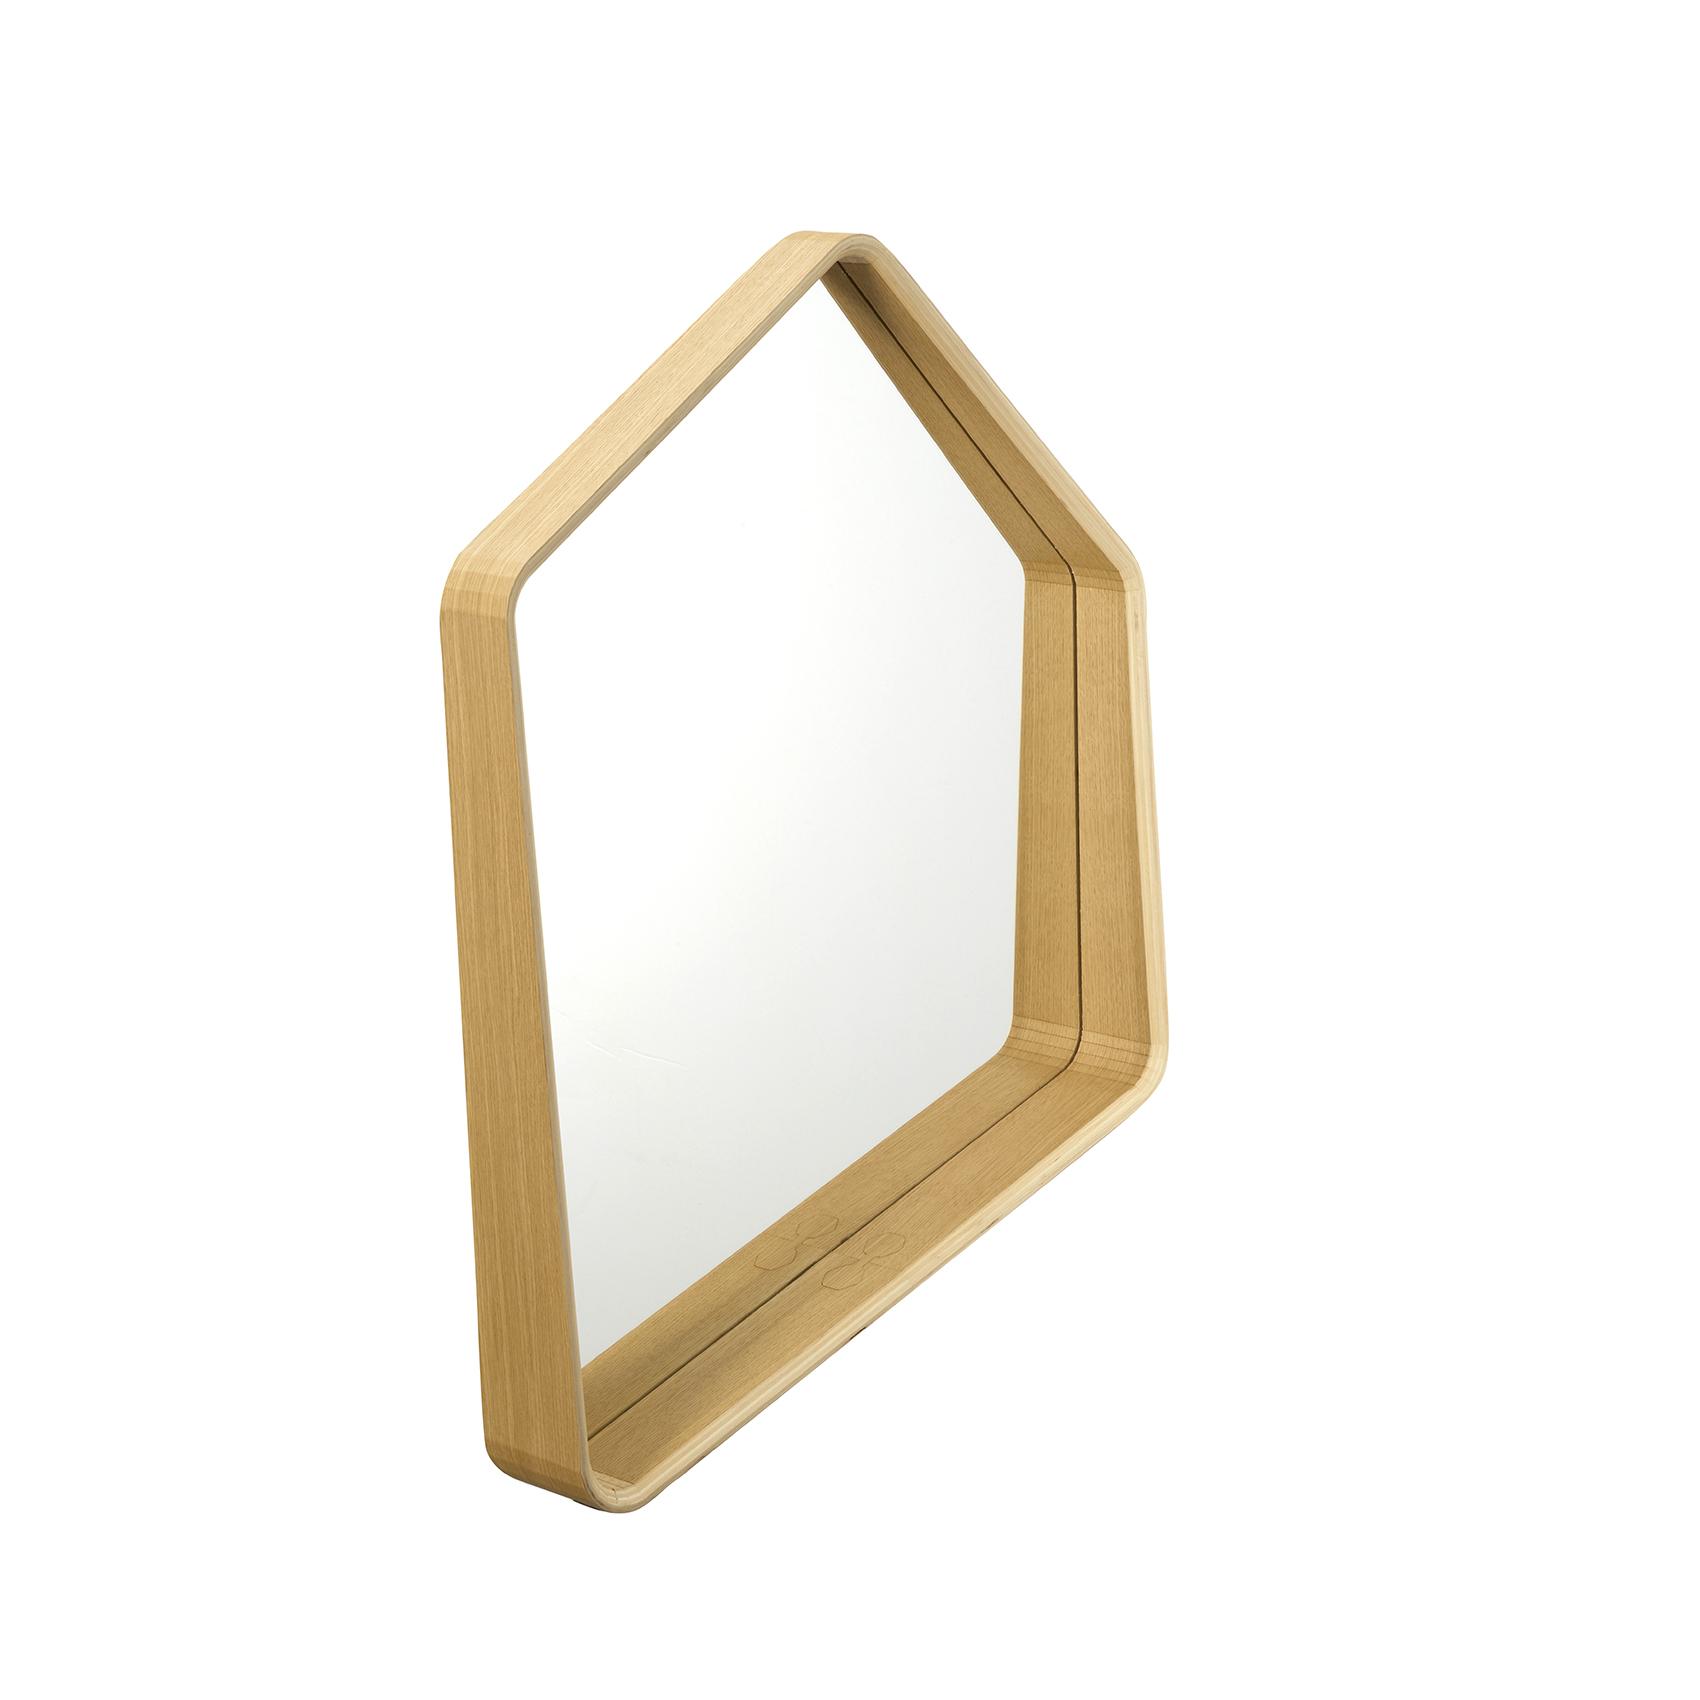 L'inatelier Miroir Folding